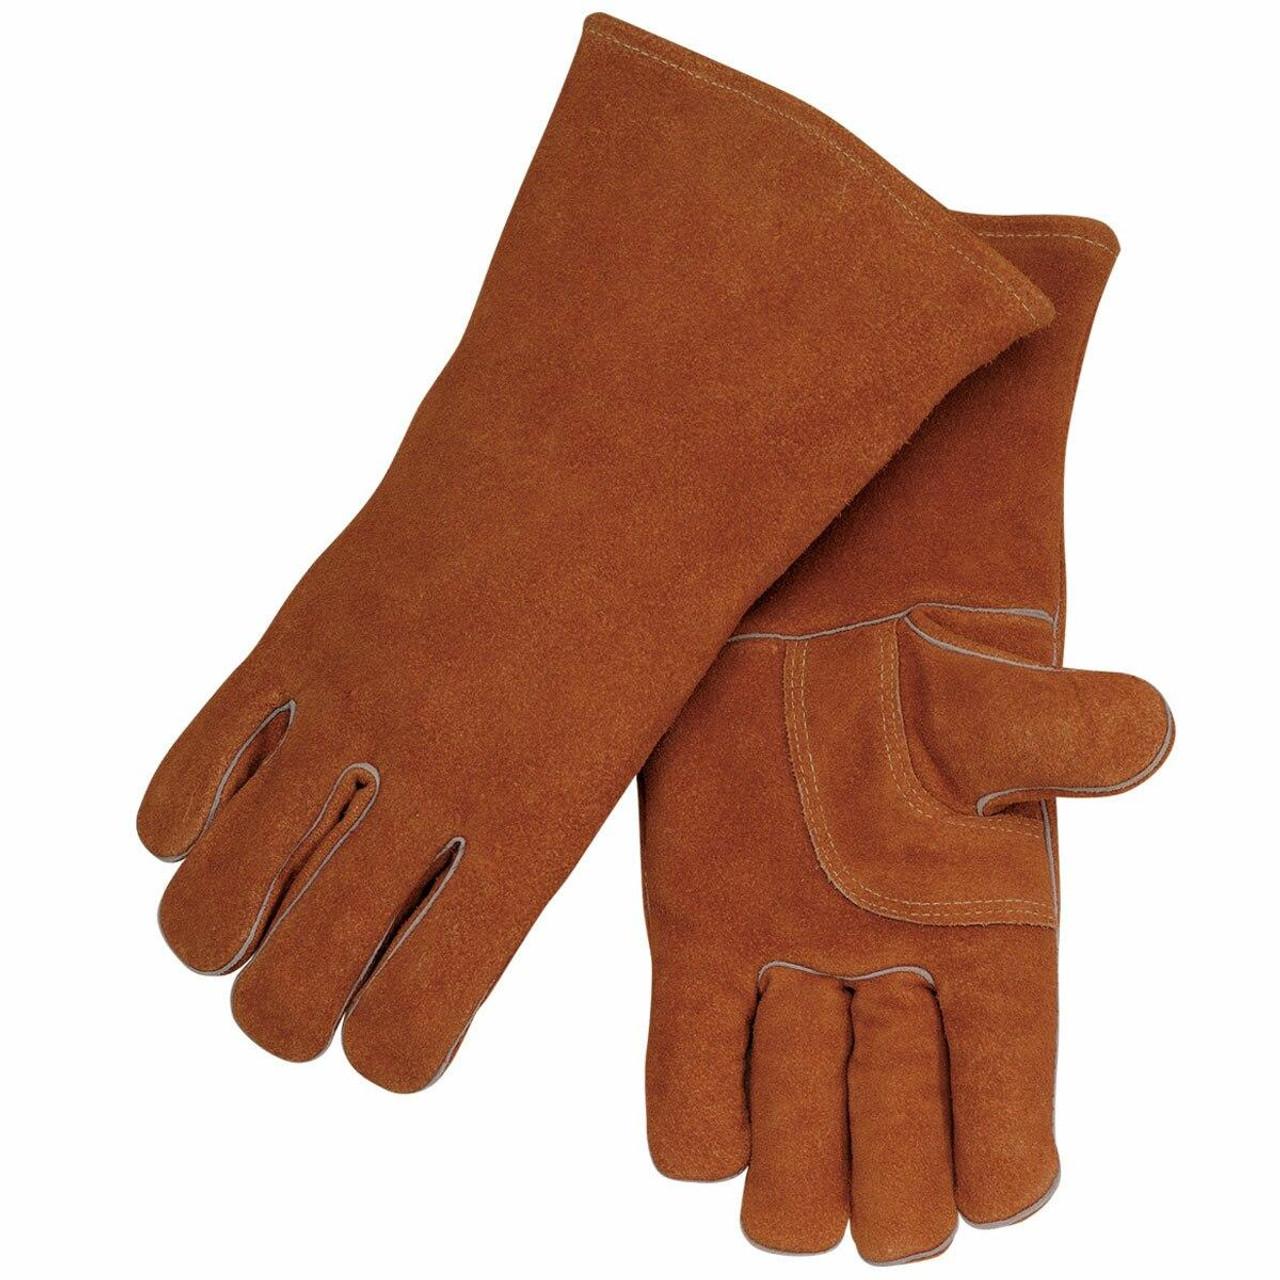 Revco Black Stallion Model 115 Split Cowhide Stick Welding Glove with Palm Guard